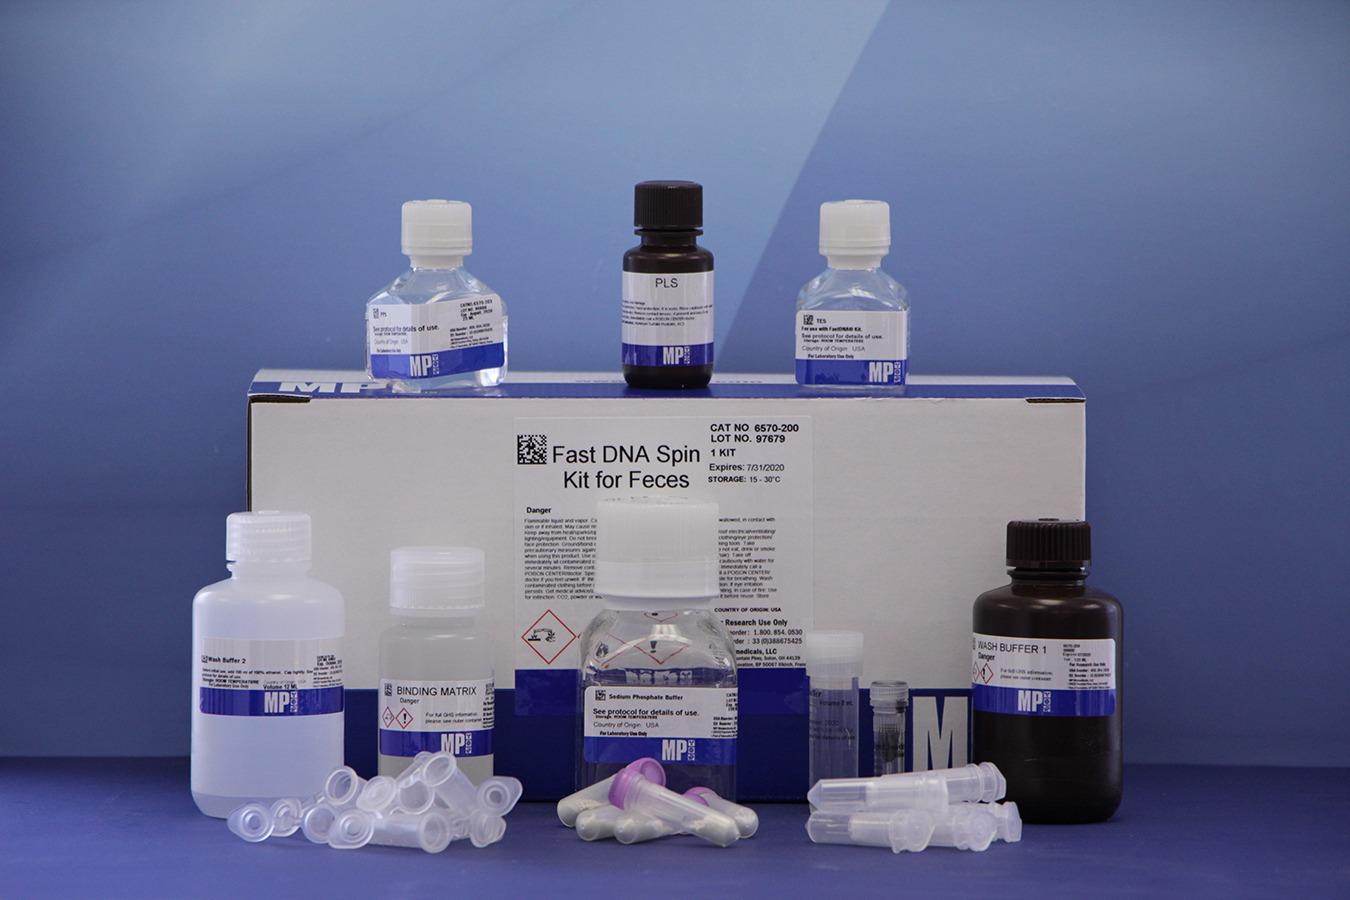 MP 粪便DNA提取试剂盒 FastDNA SPIN Kit for Feces